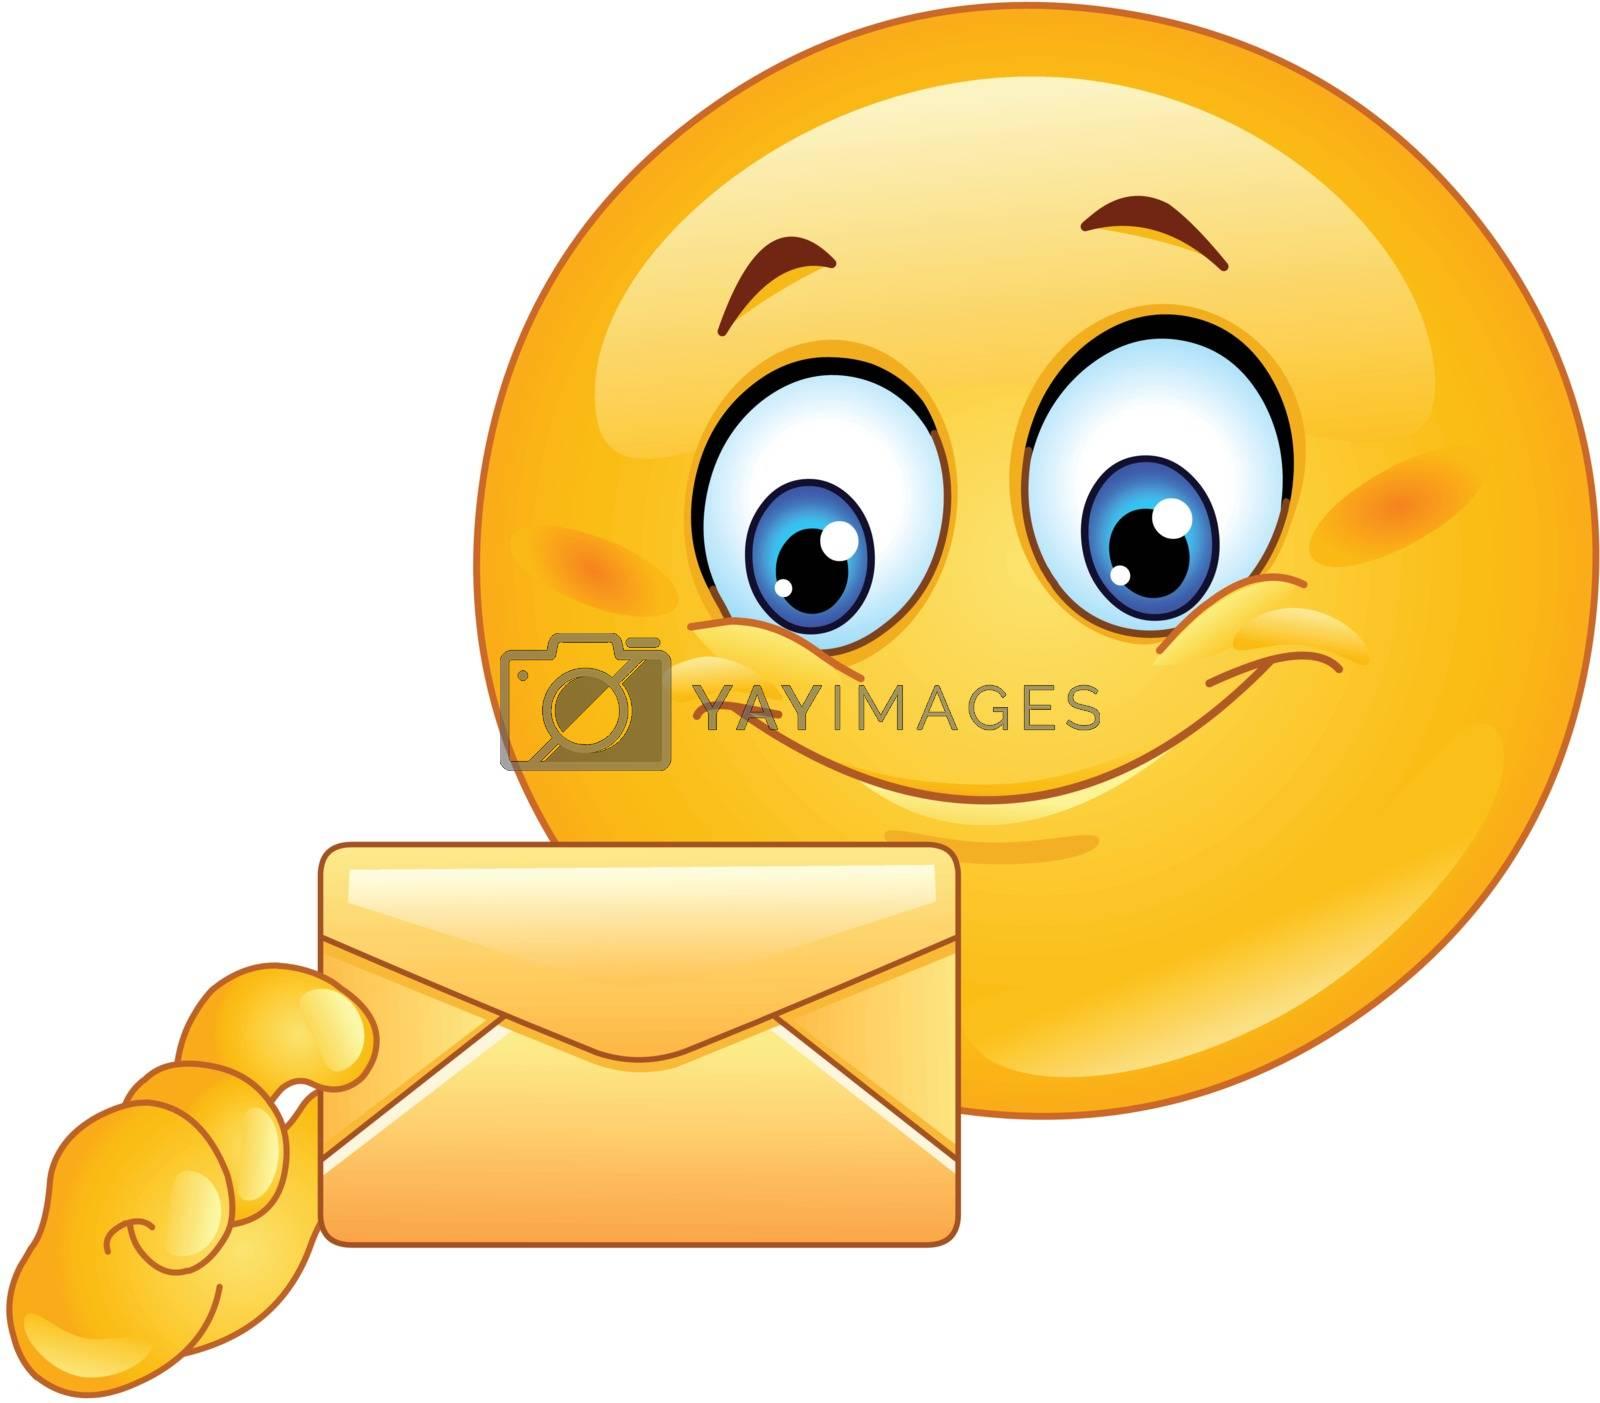 Royalty free image of Emoticon with envelope by yayayoyo